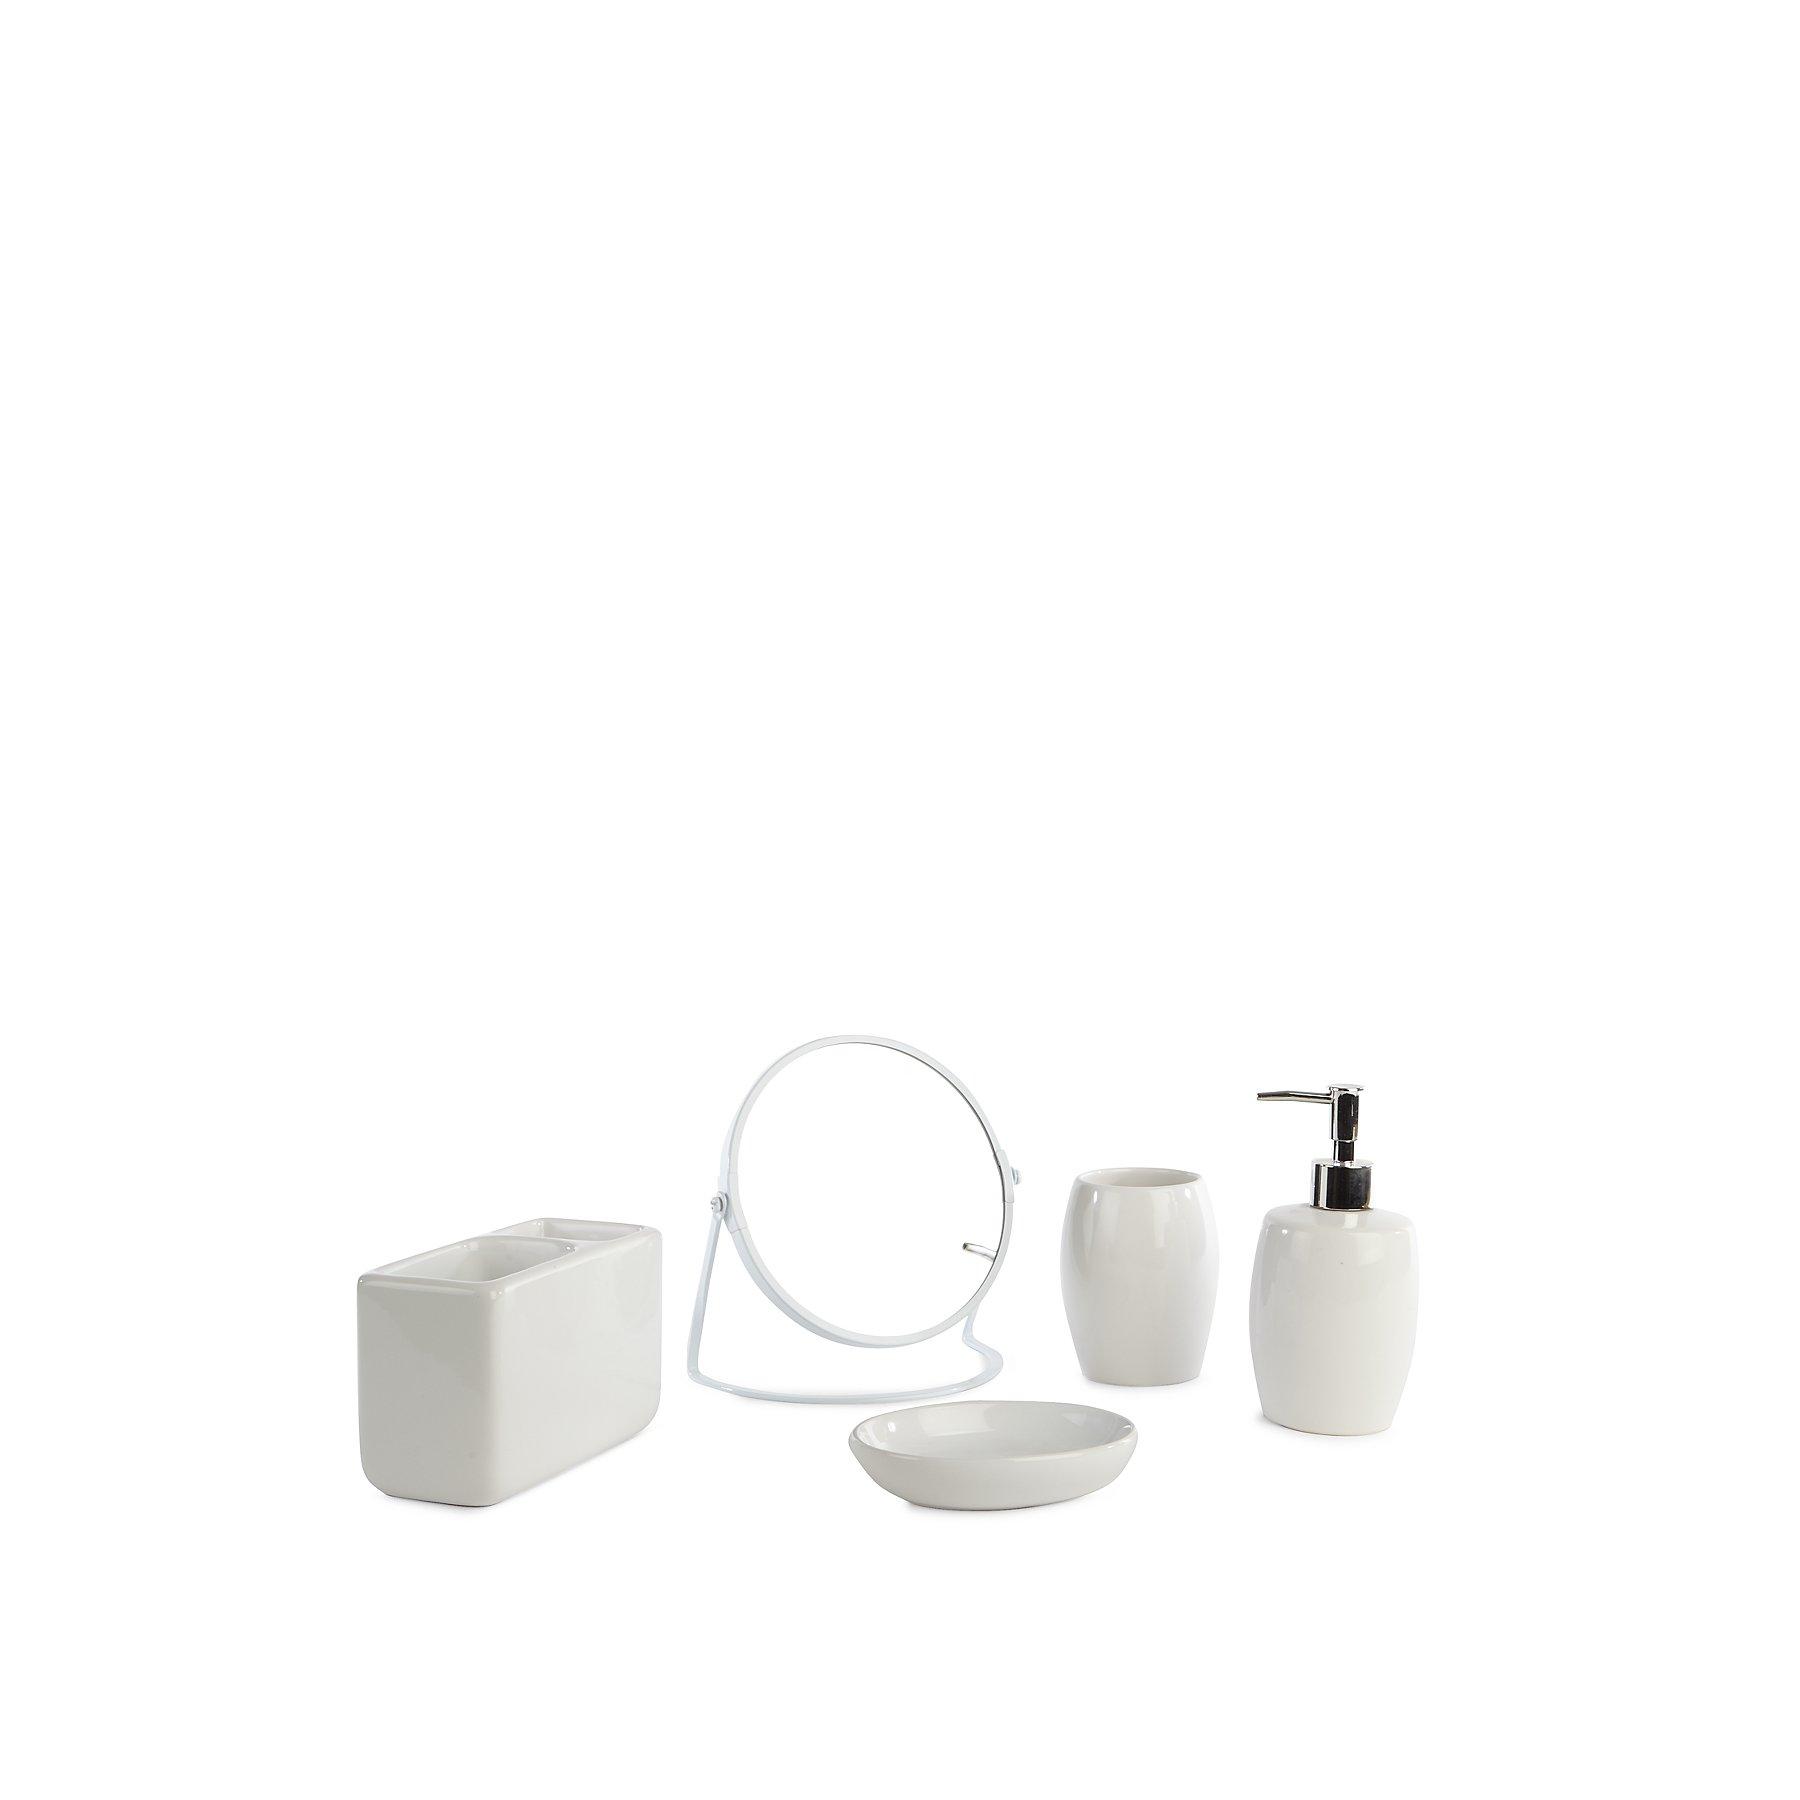 White Ceramic Bathroom Range  Bathroom Accessories  George at ASDA